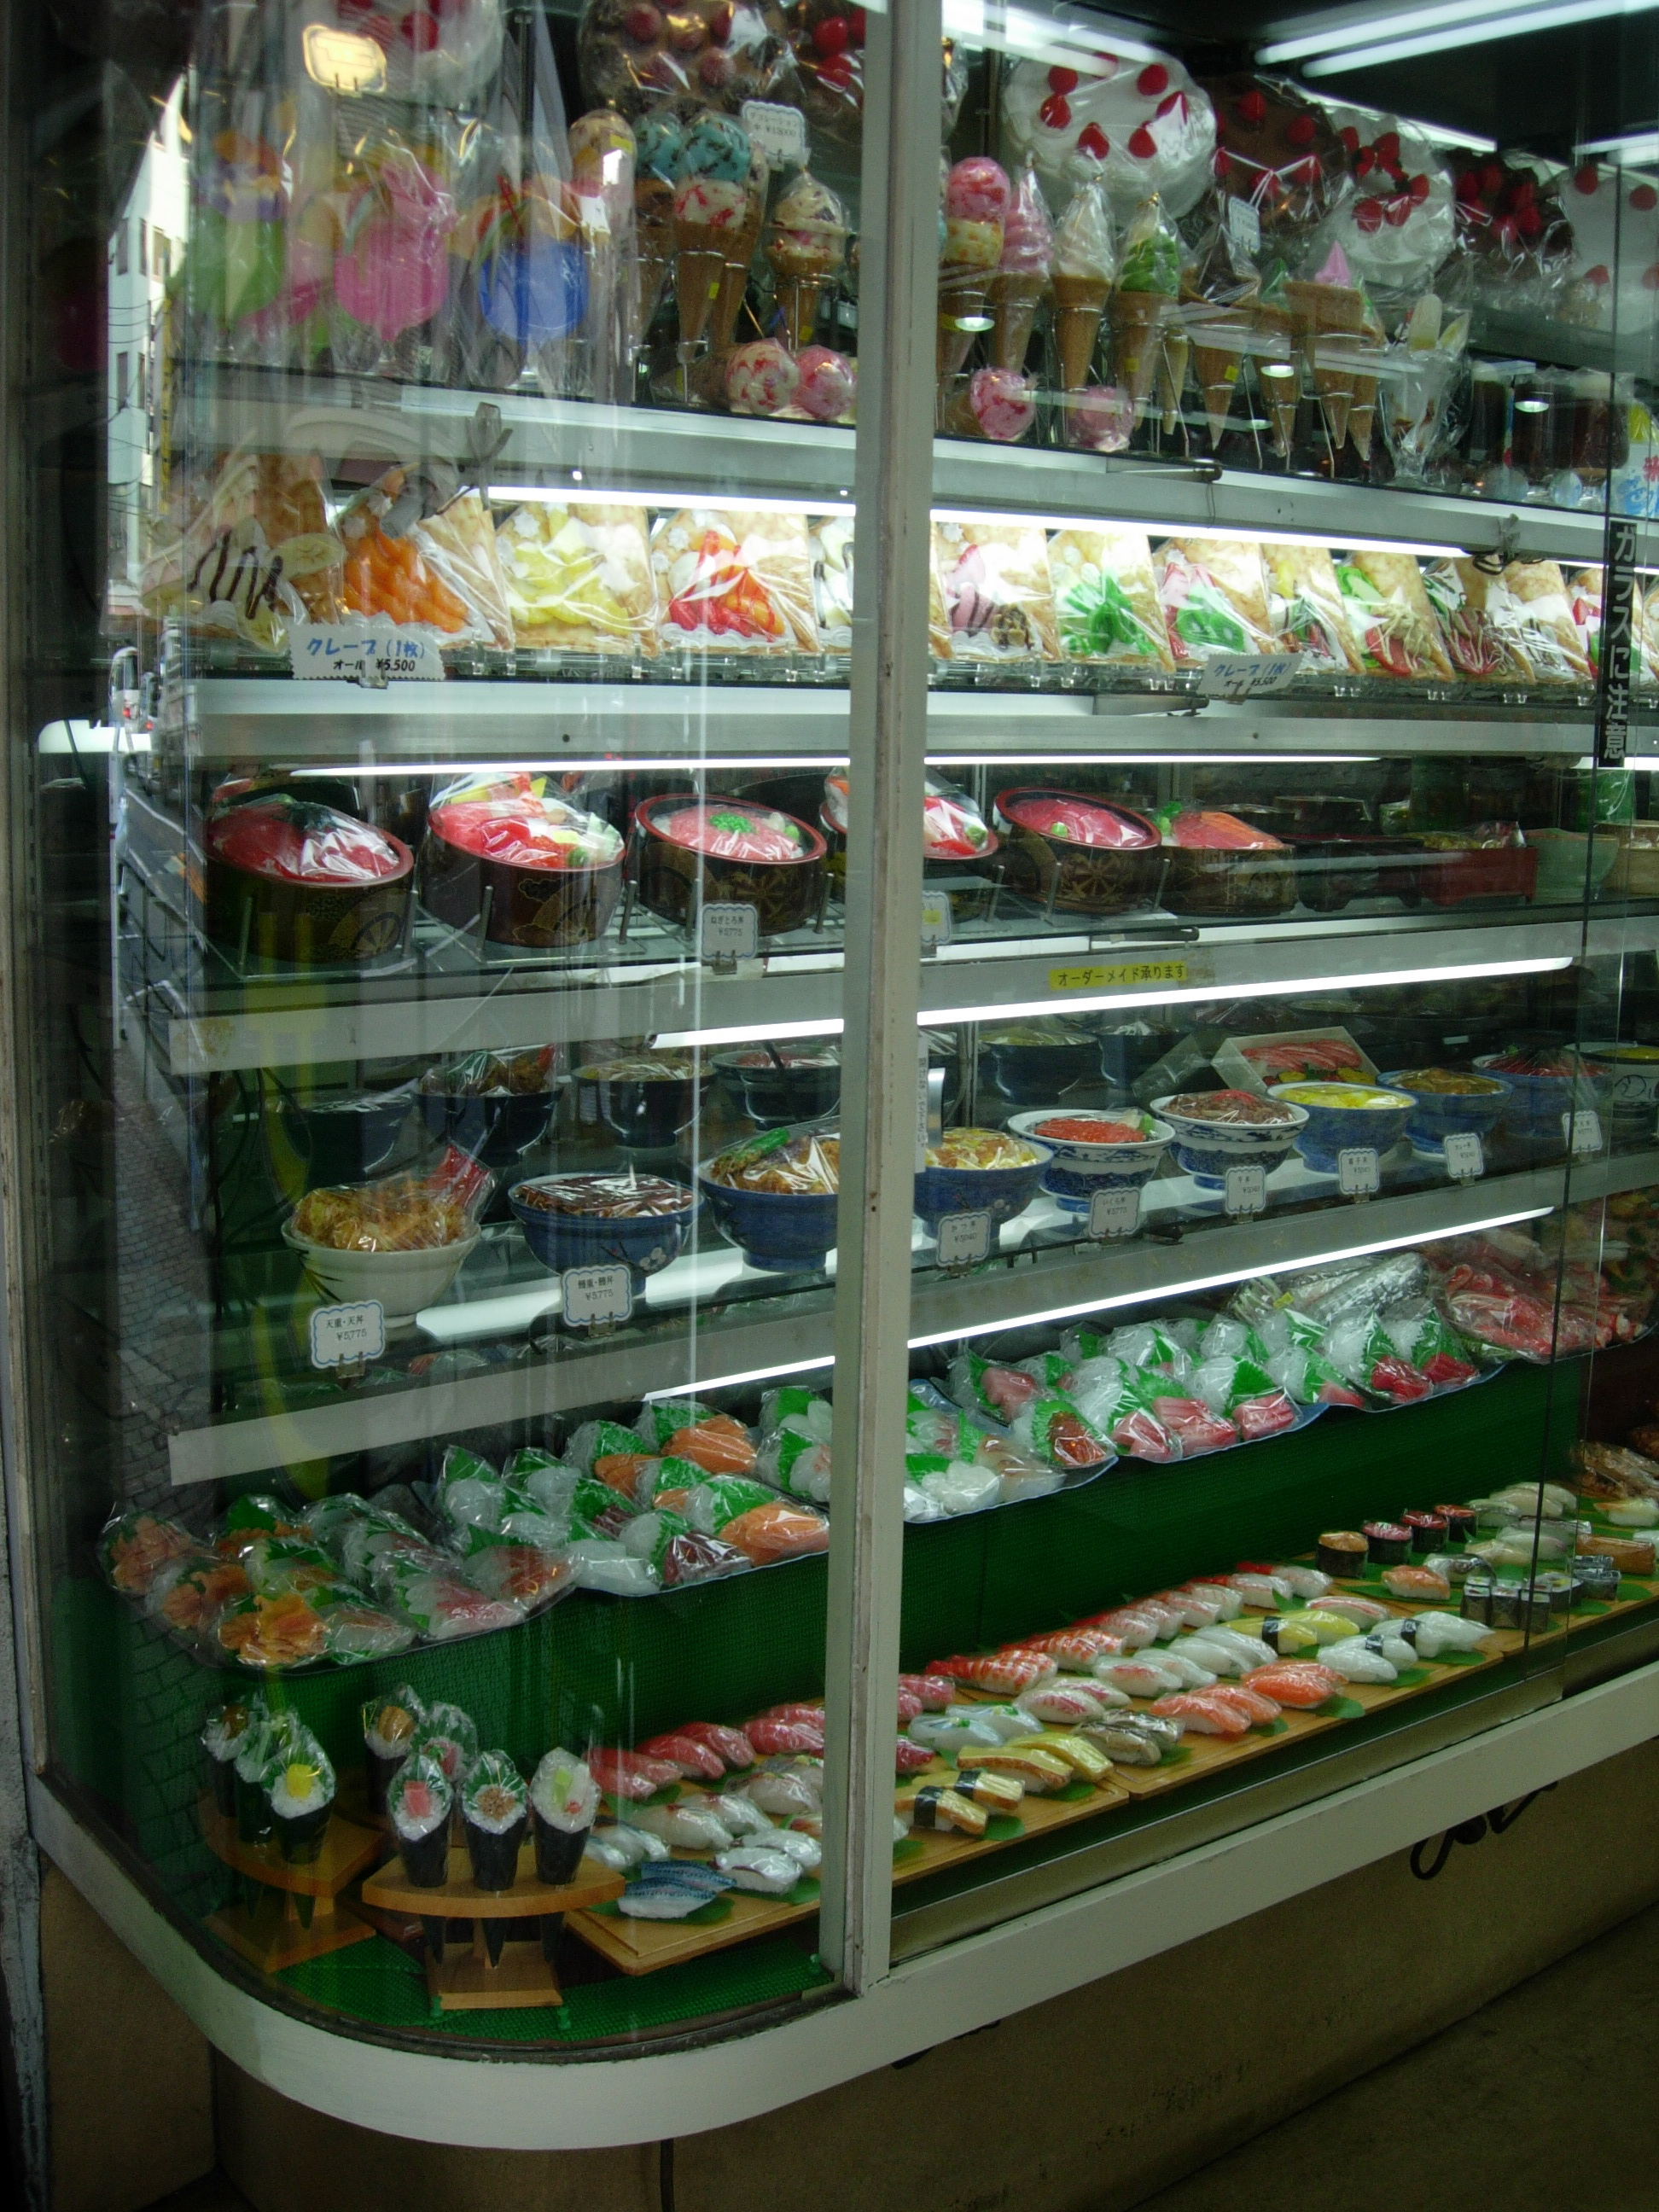 Sweets, crepes, donburi, sashimi, and sushi.